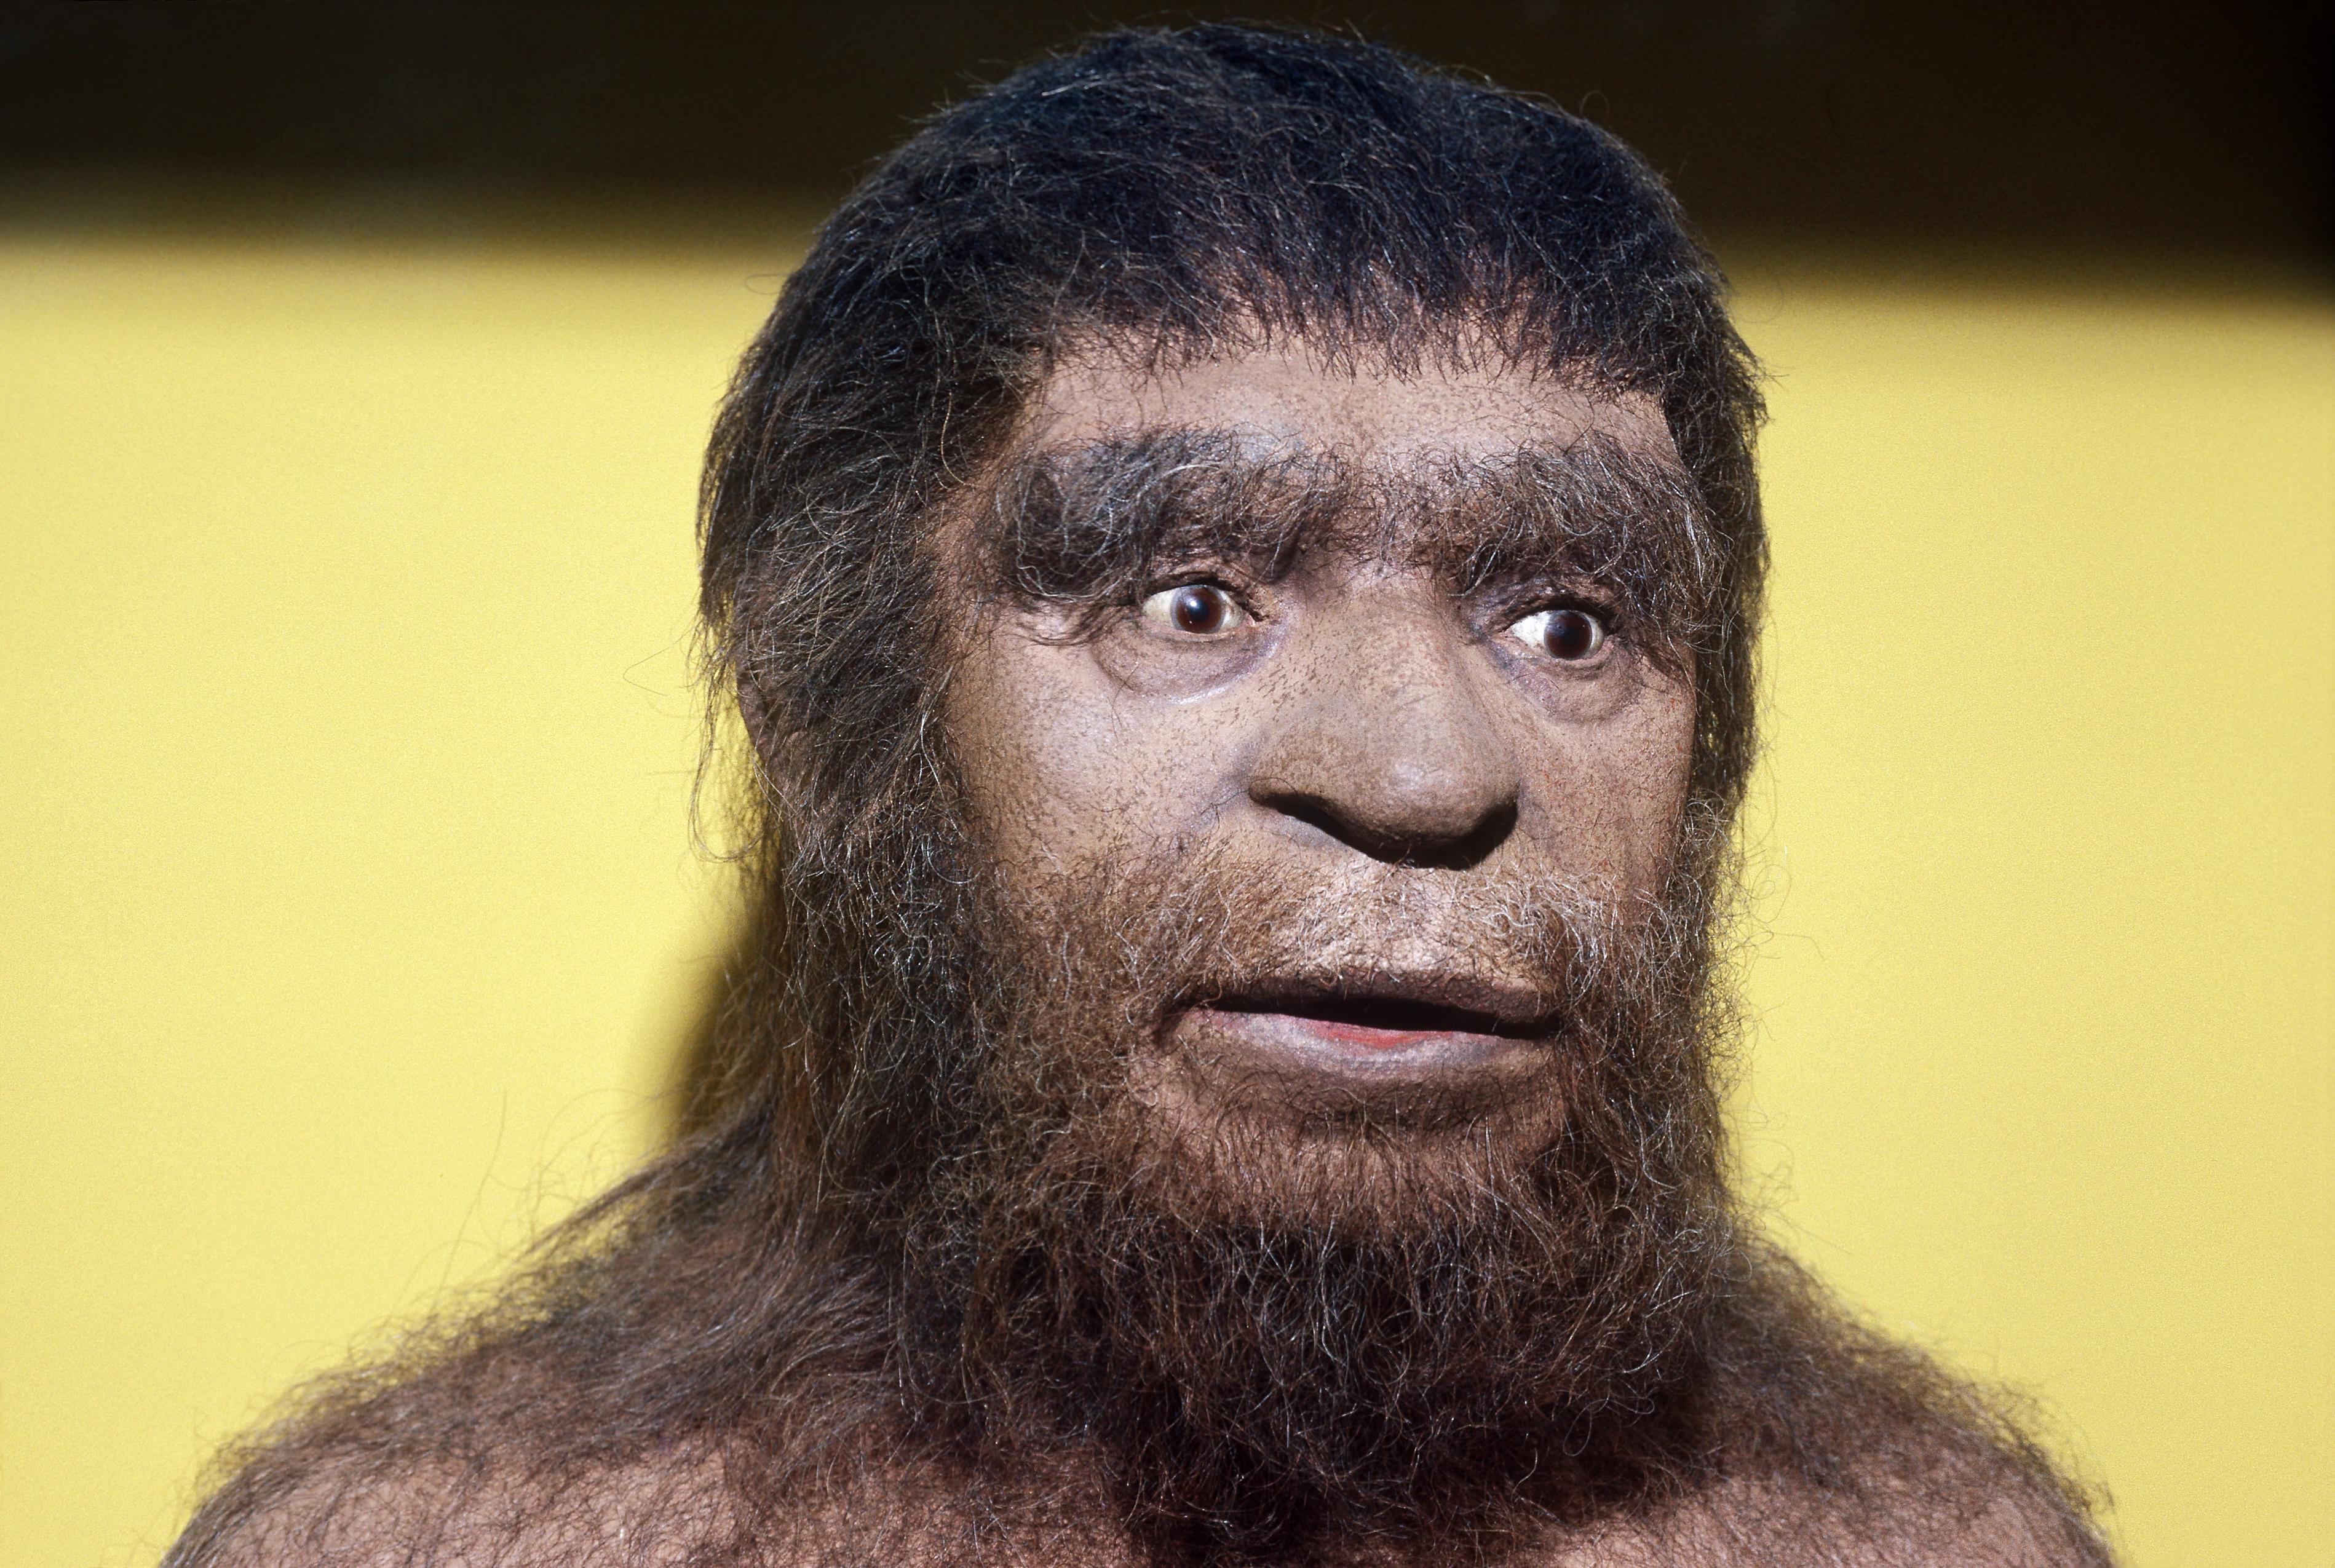 How Long Ago Did Cavemen Walk The Earth